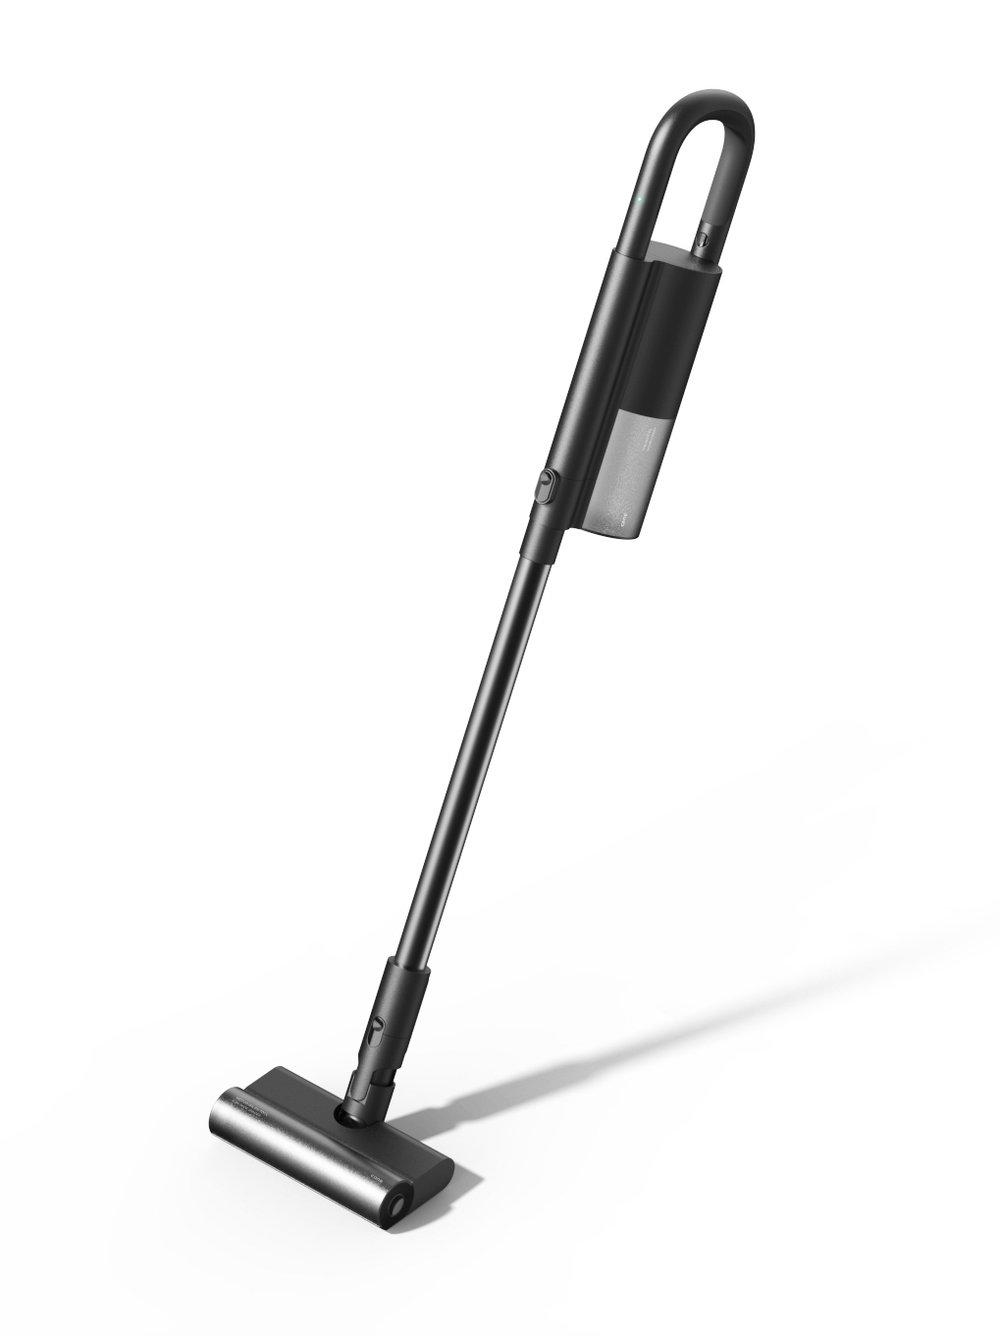 cane add image1.jpg